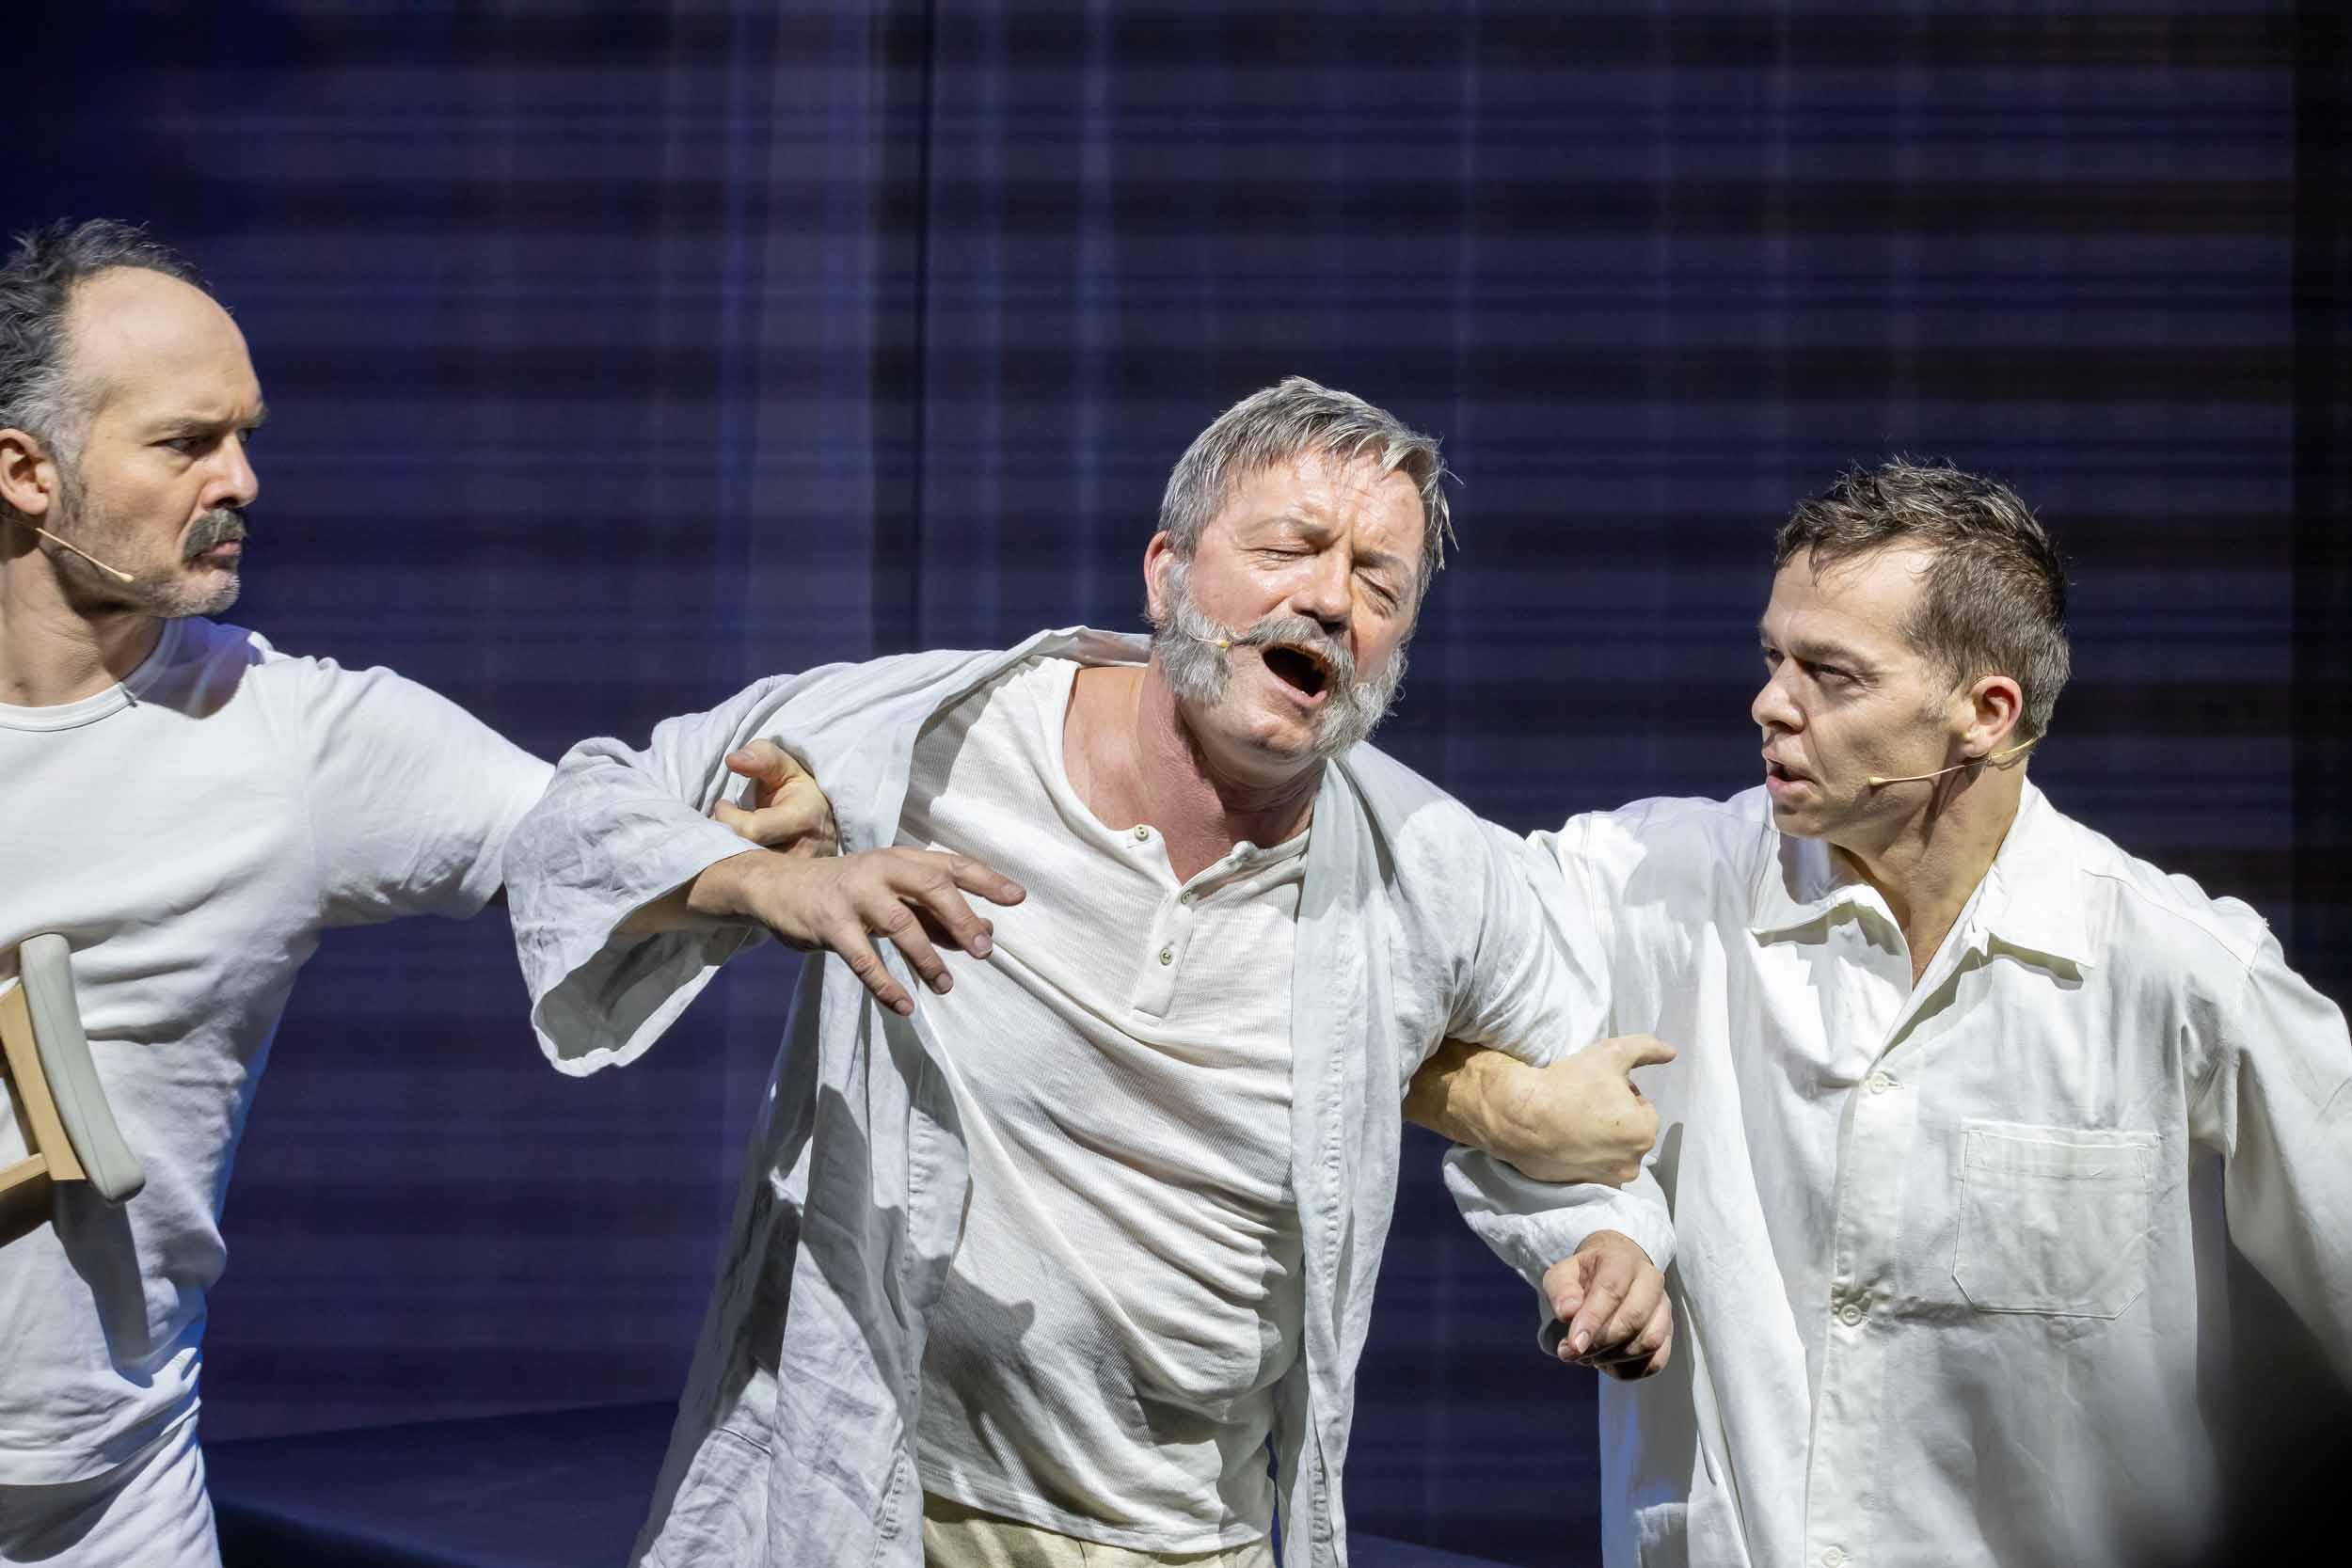 v.l.n.r. Marco Heinrich (Ensemble), Frank Logemann (Dr. EWatson) + Michael Clauder (Ensemble, Fight Choreograf) © Mirco Wallat